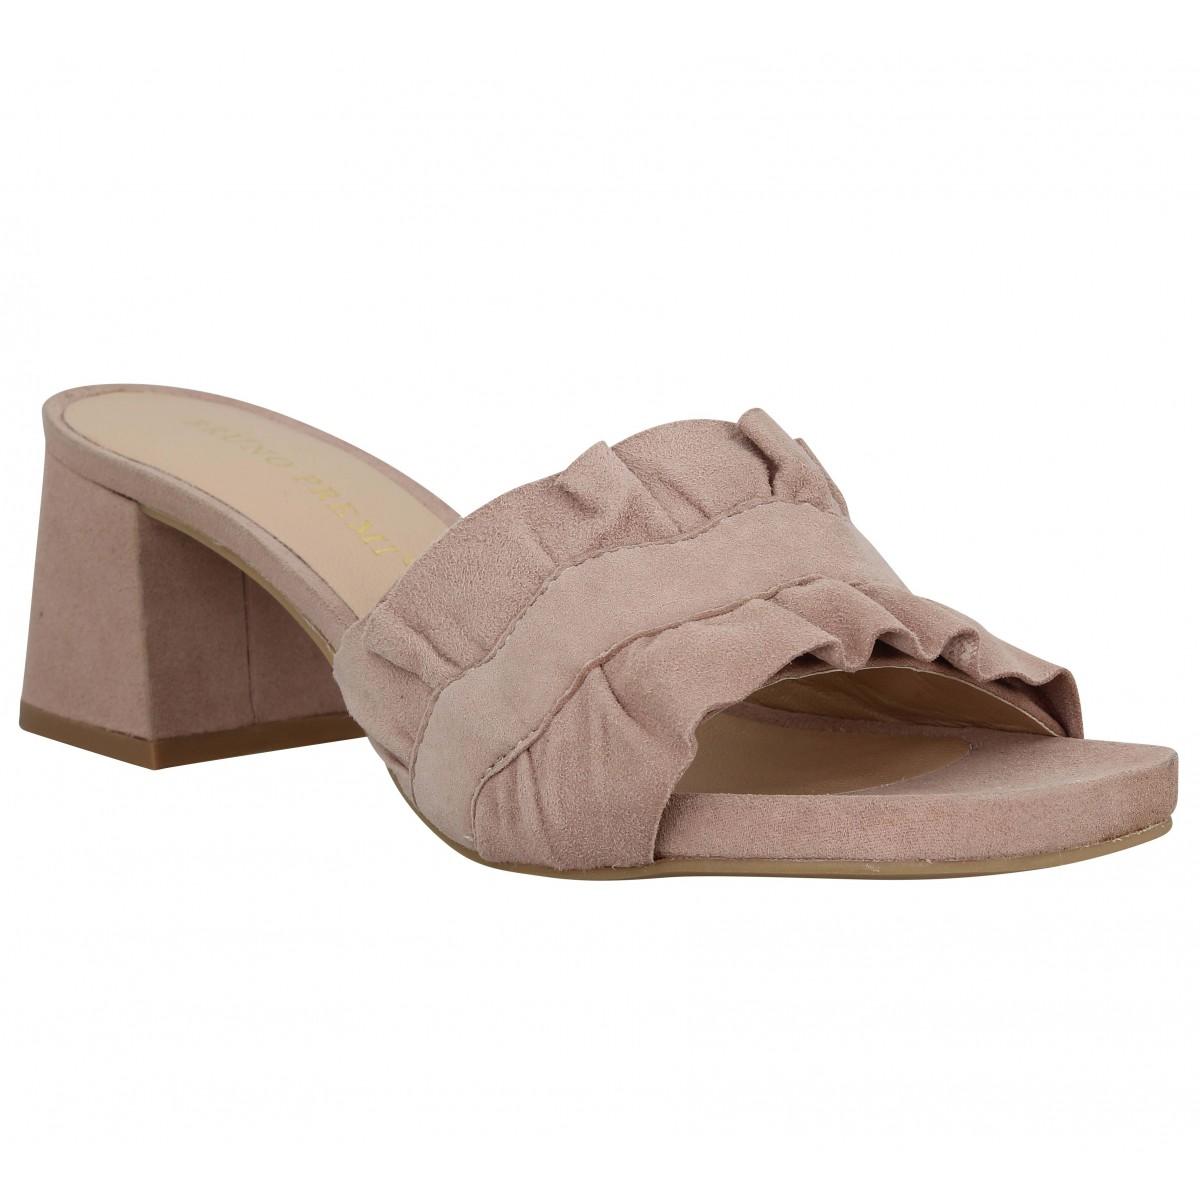 Chaussures - Mules Bruno Premi 7IbIRx